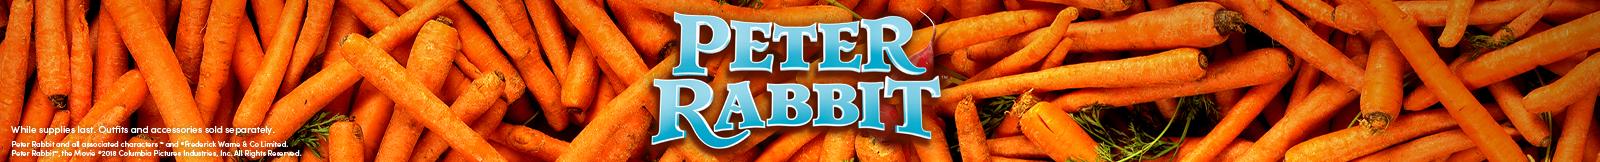 Peter Rabbit Stuffed Animals